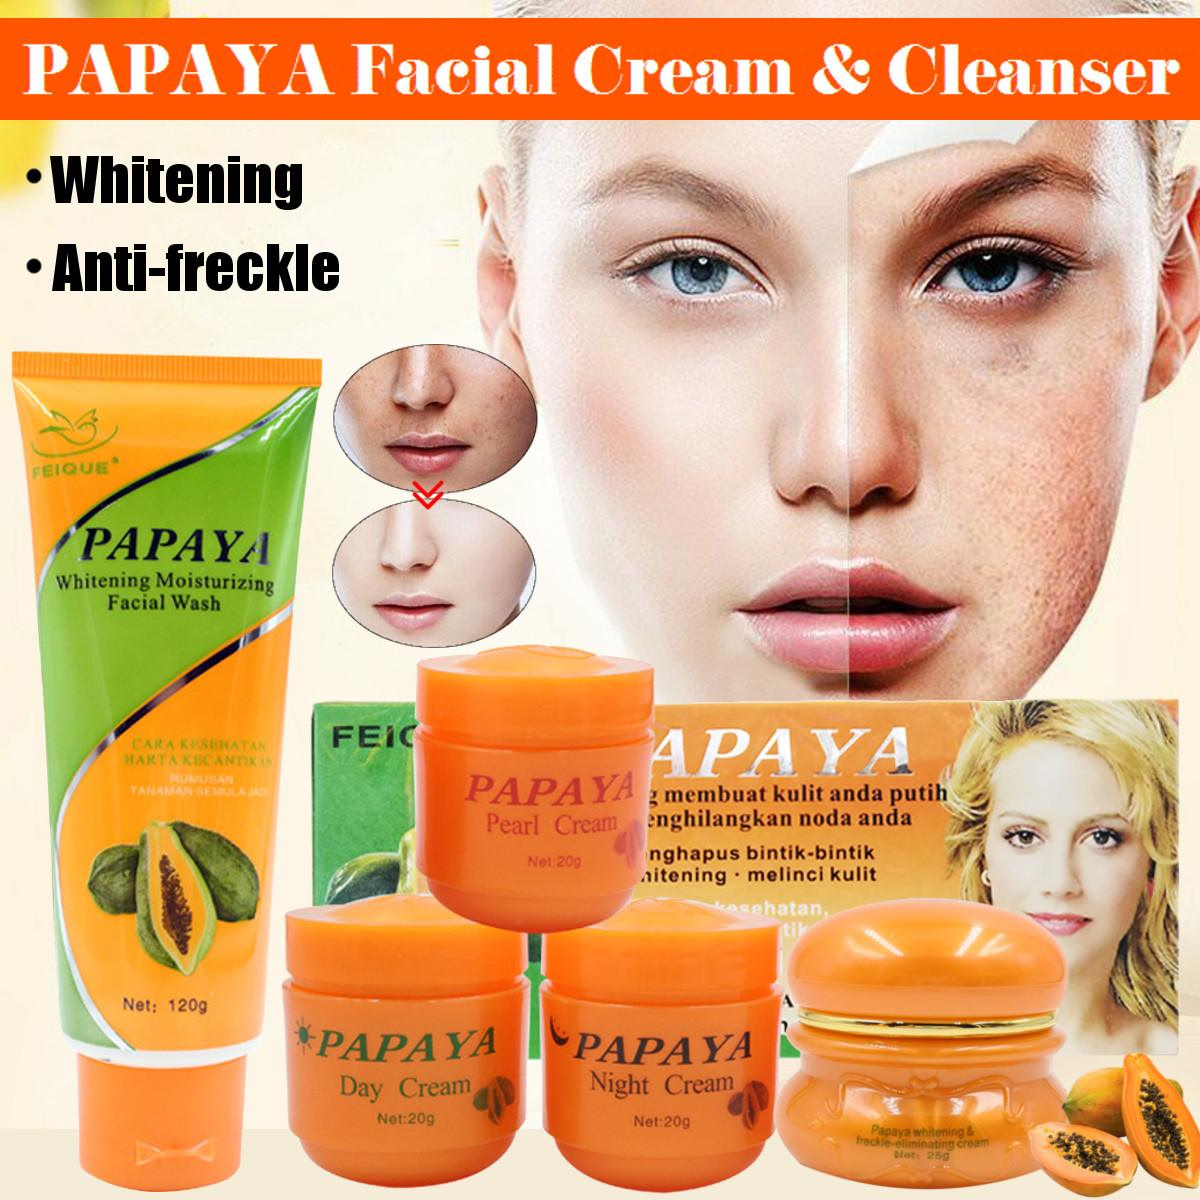 Crema blanqueadora de Papaya para cara, fórmula botánica Natural antipecas, crema de día + crema nocturna + crema perlada + blanqueadora